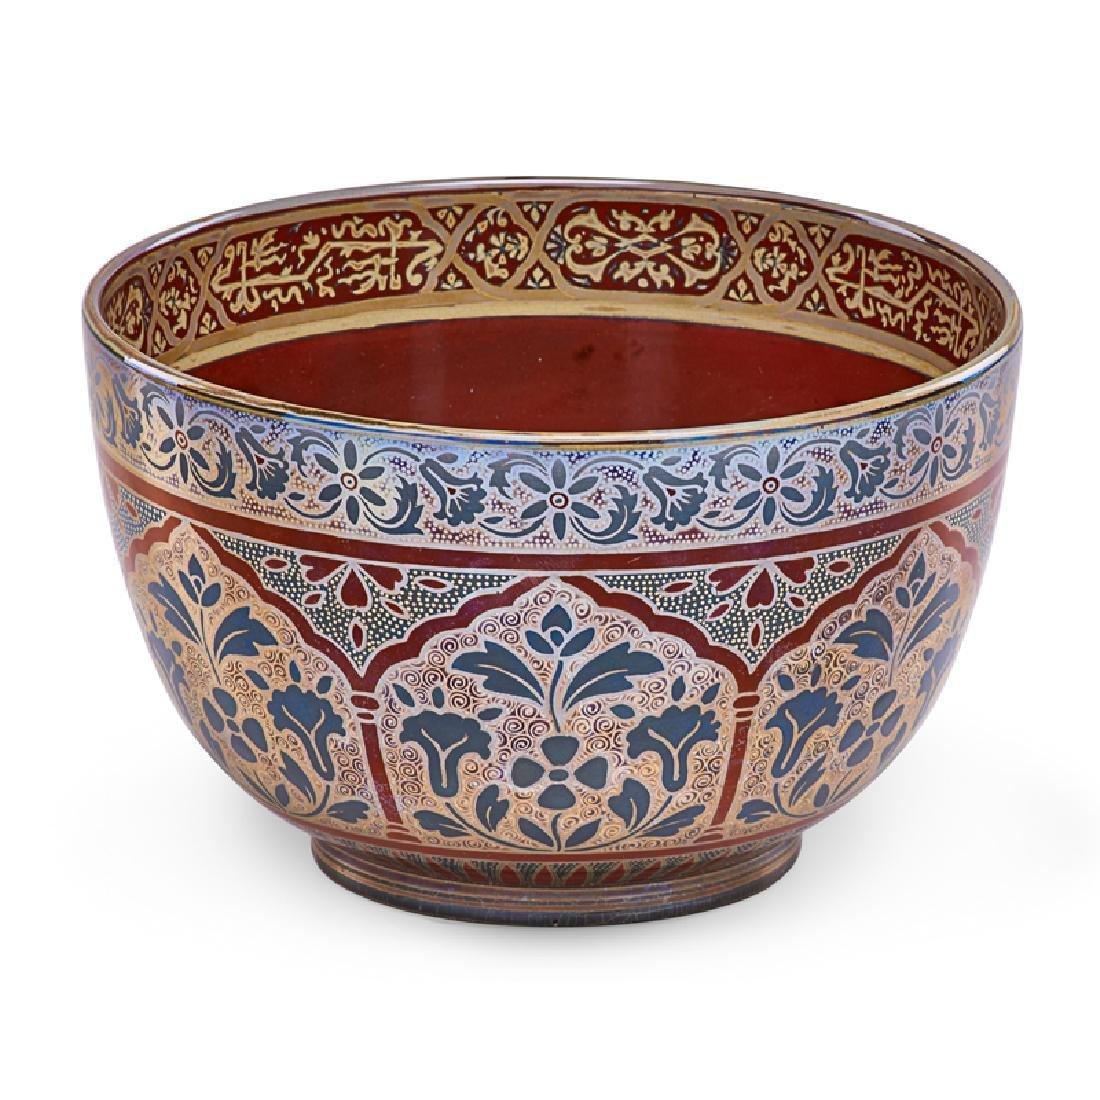 ZSOLNAY Bowl with stylized design